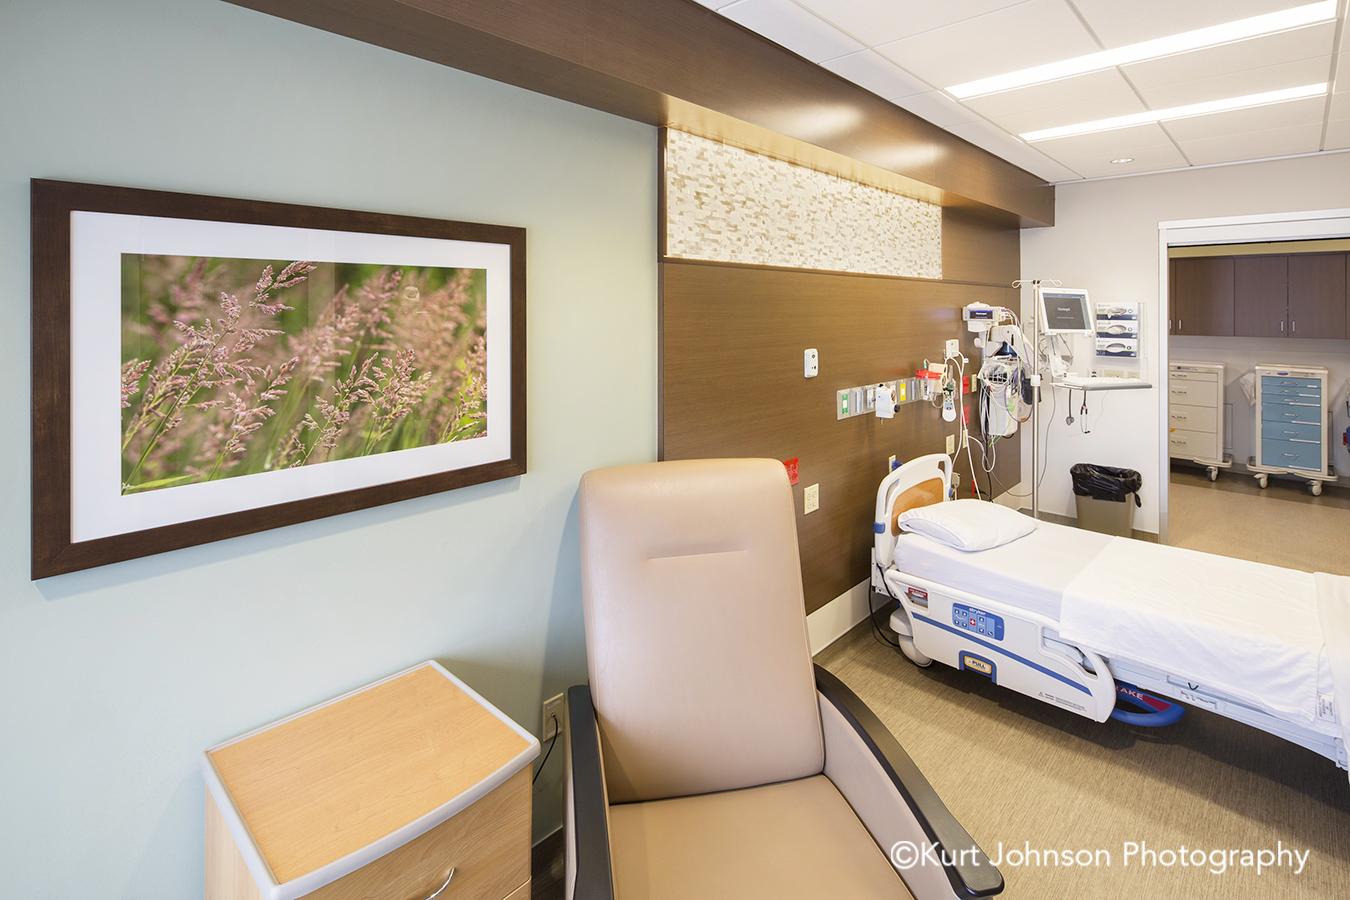 Brooking SD South Dakota install framed wall art frame installation brown yellow grass grasses patient room chair